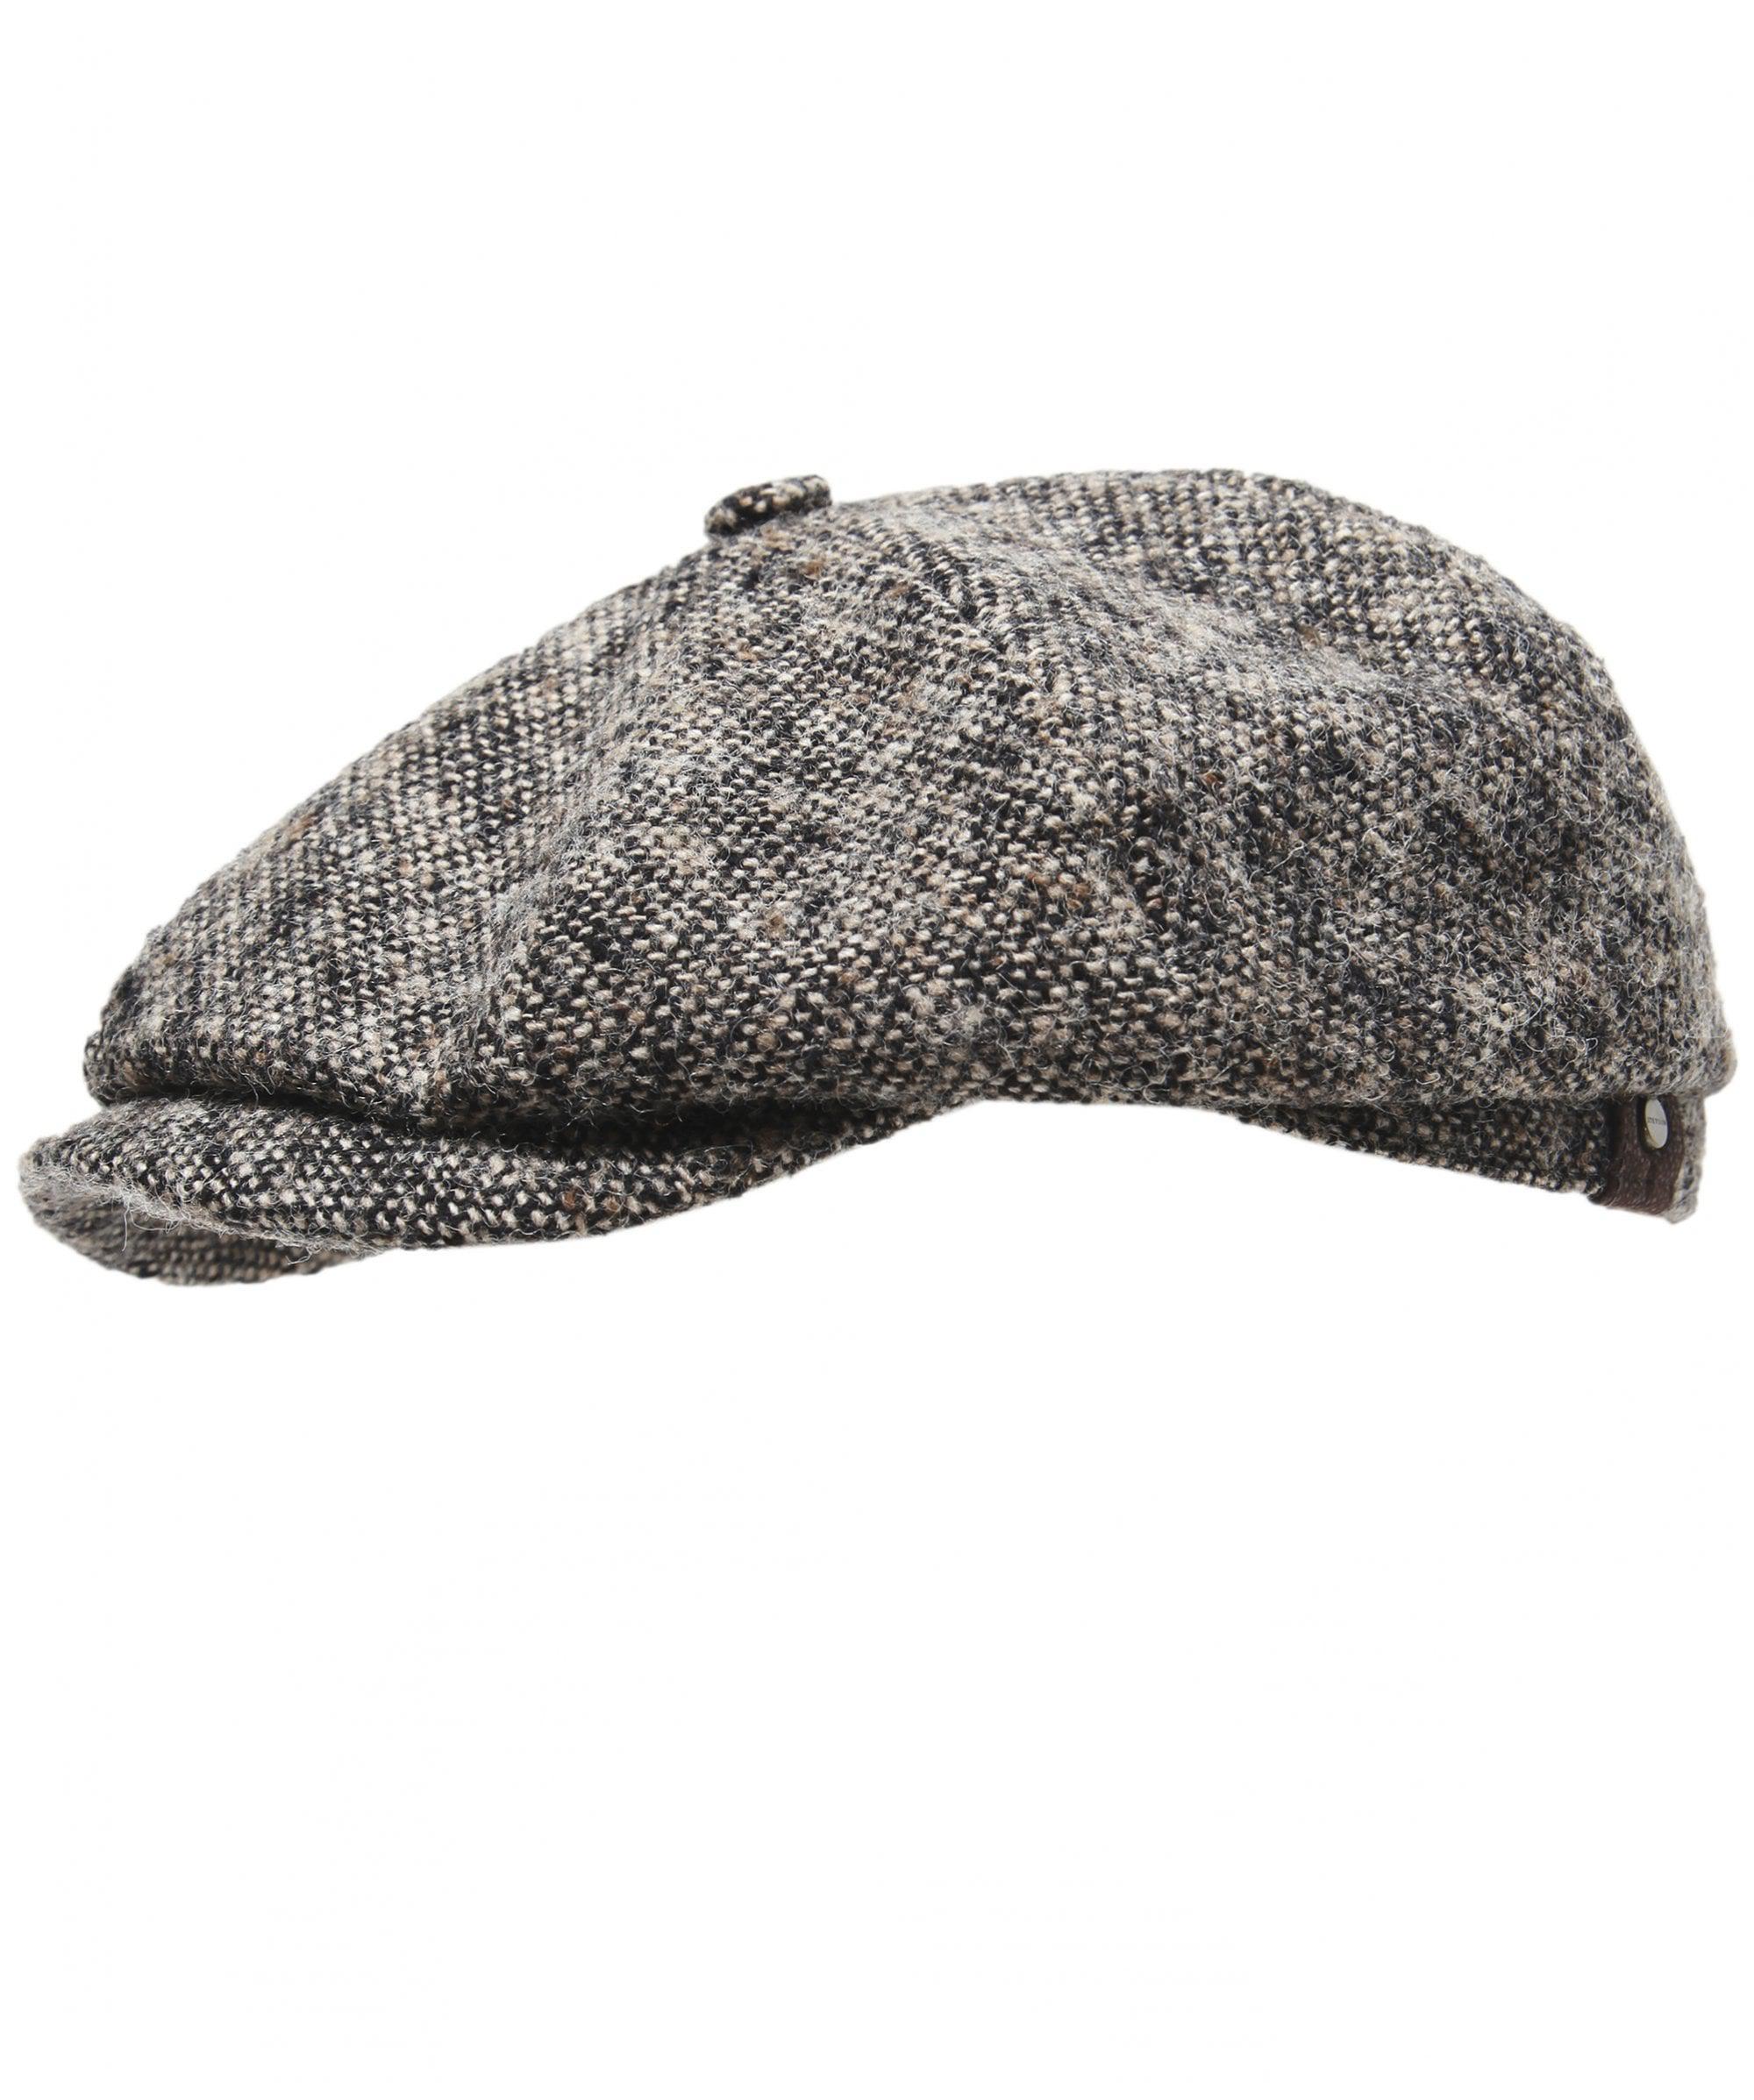 Lyst Stetson Virgin Wool Hatteras Donegal Cap In Black For Men 3e4ad874c44a